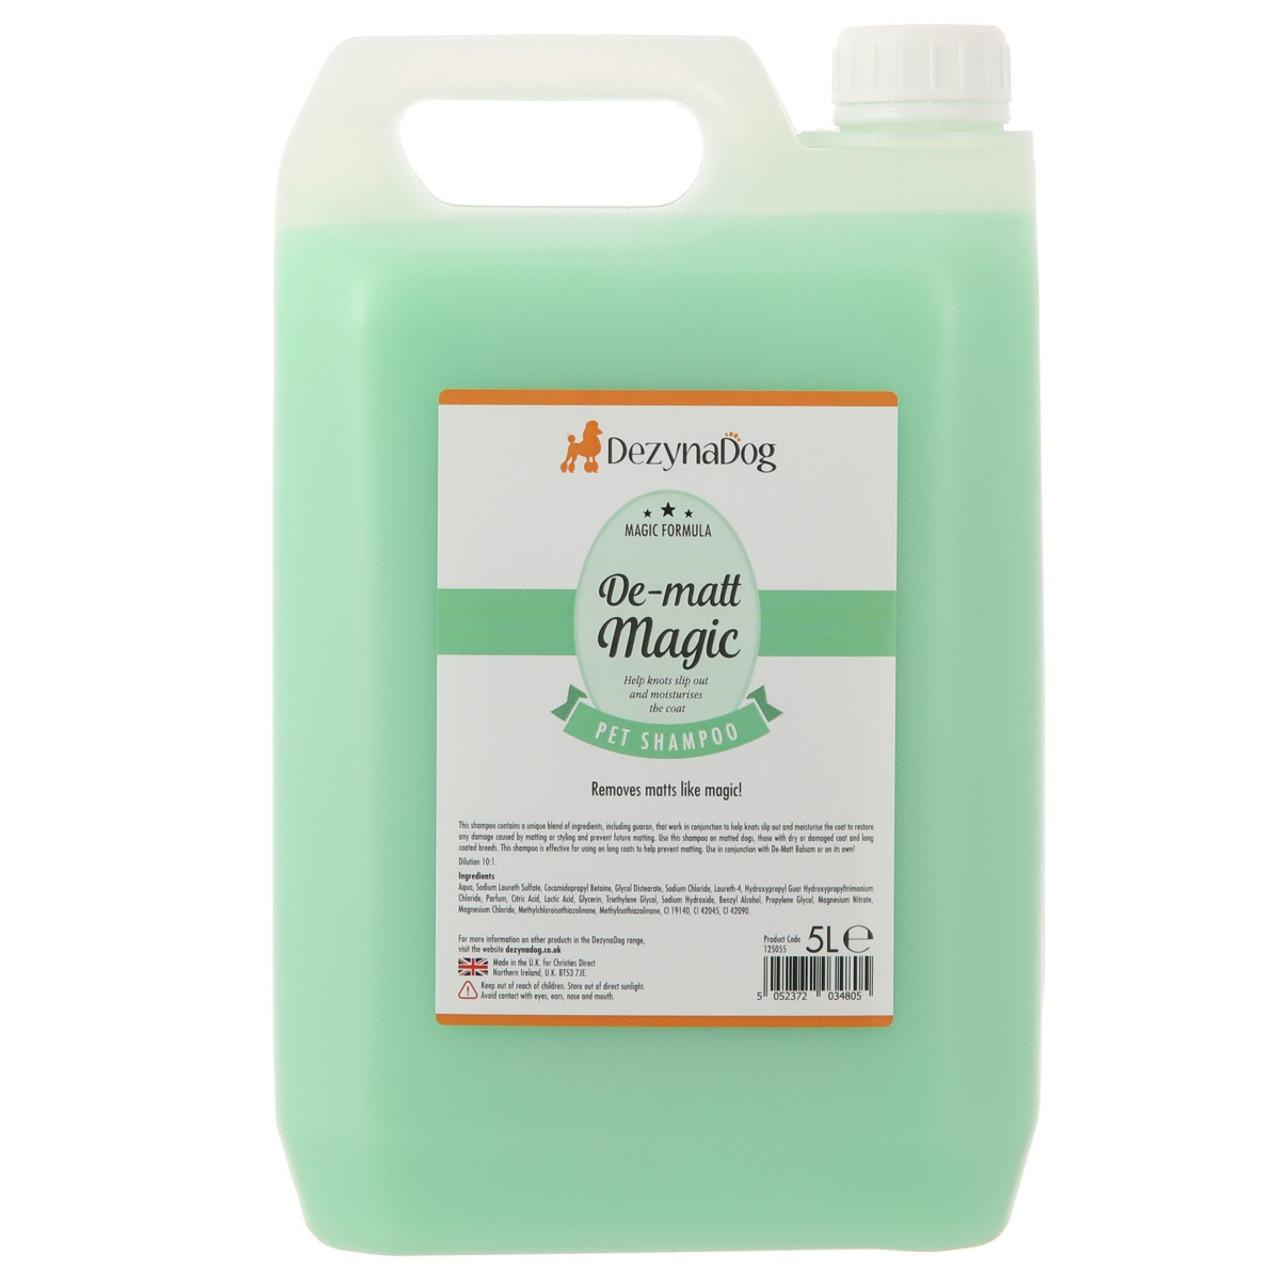 DeZynaDog De-Matt Magic Shampoo 5L